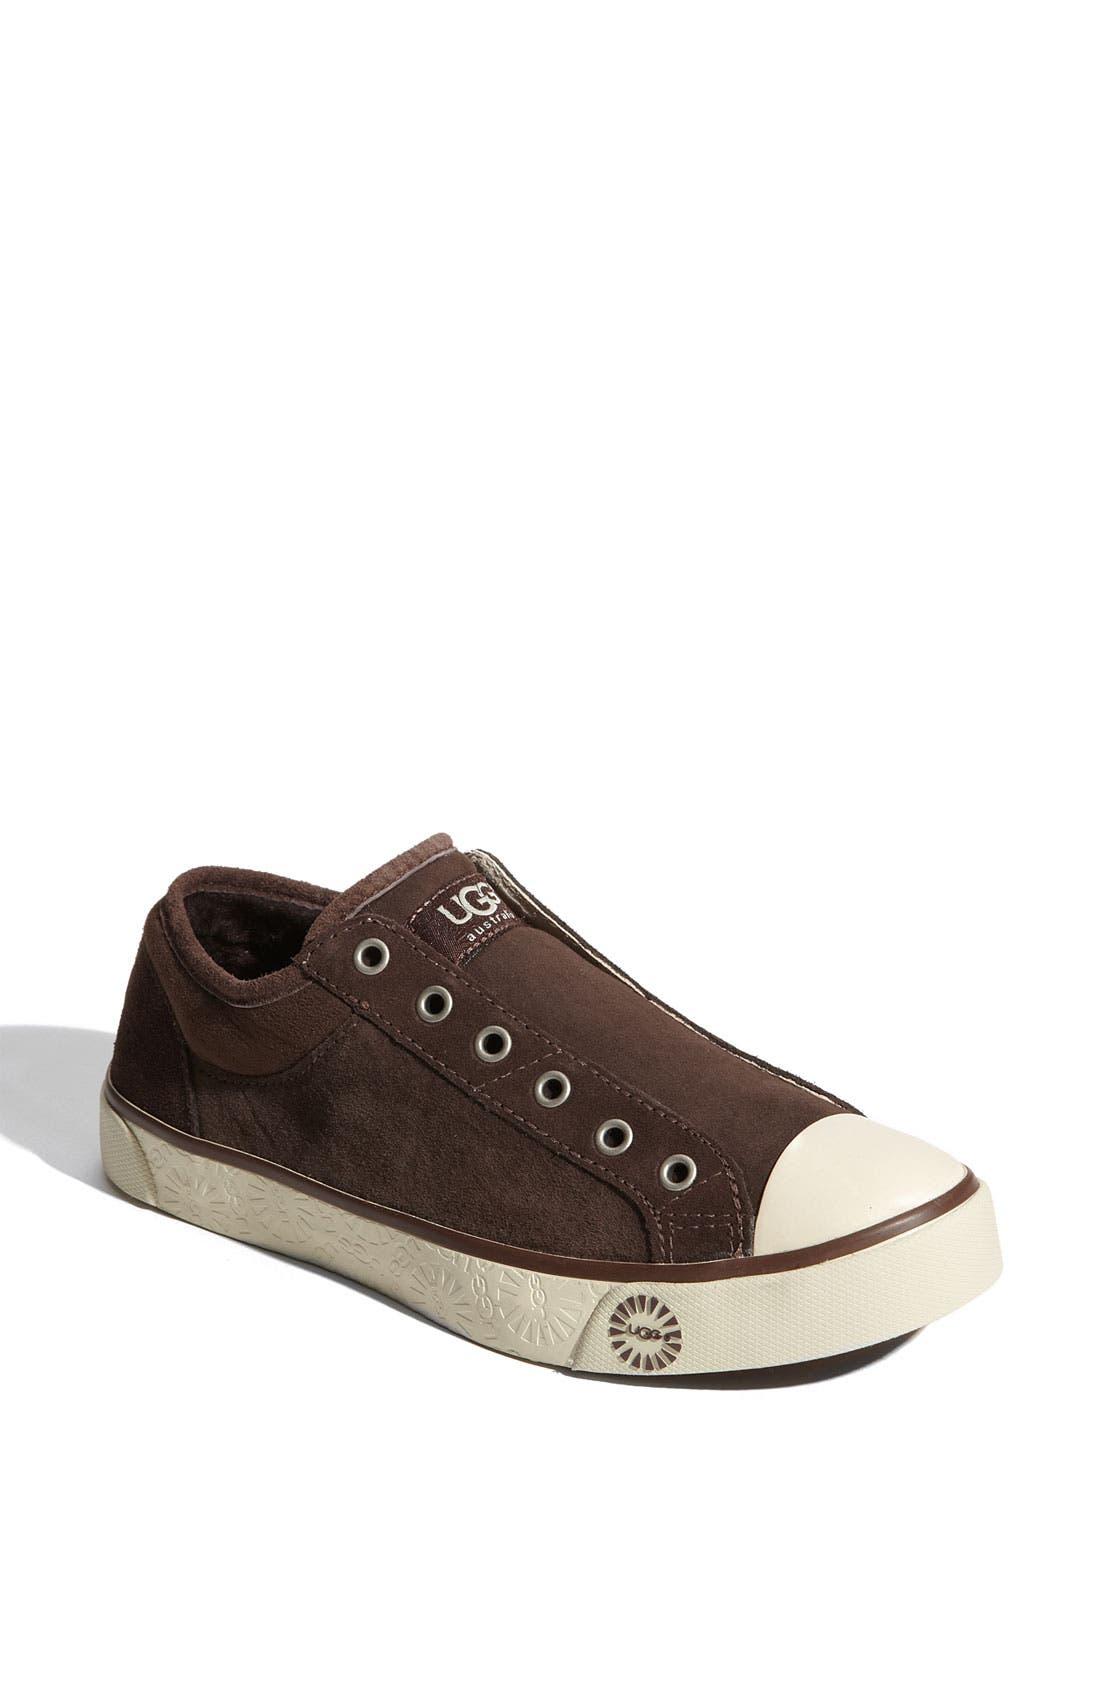 Alternate Image 1 Selected - UGG® Australia 'Laela' Sneaker (Women)